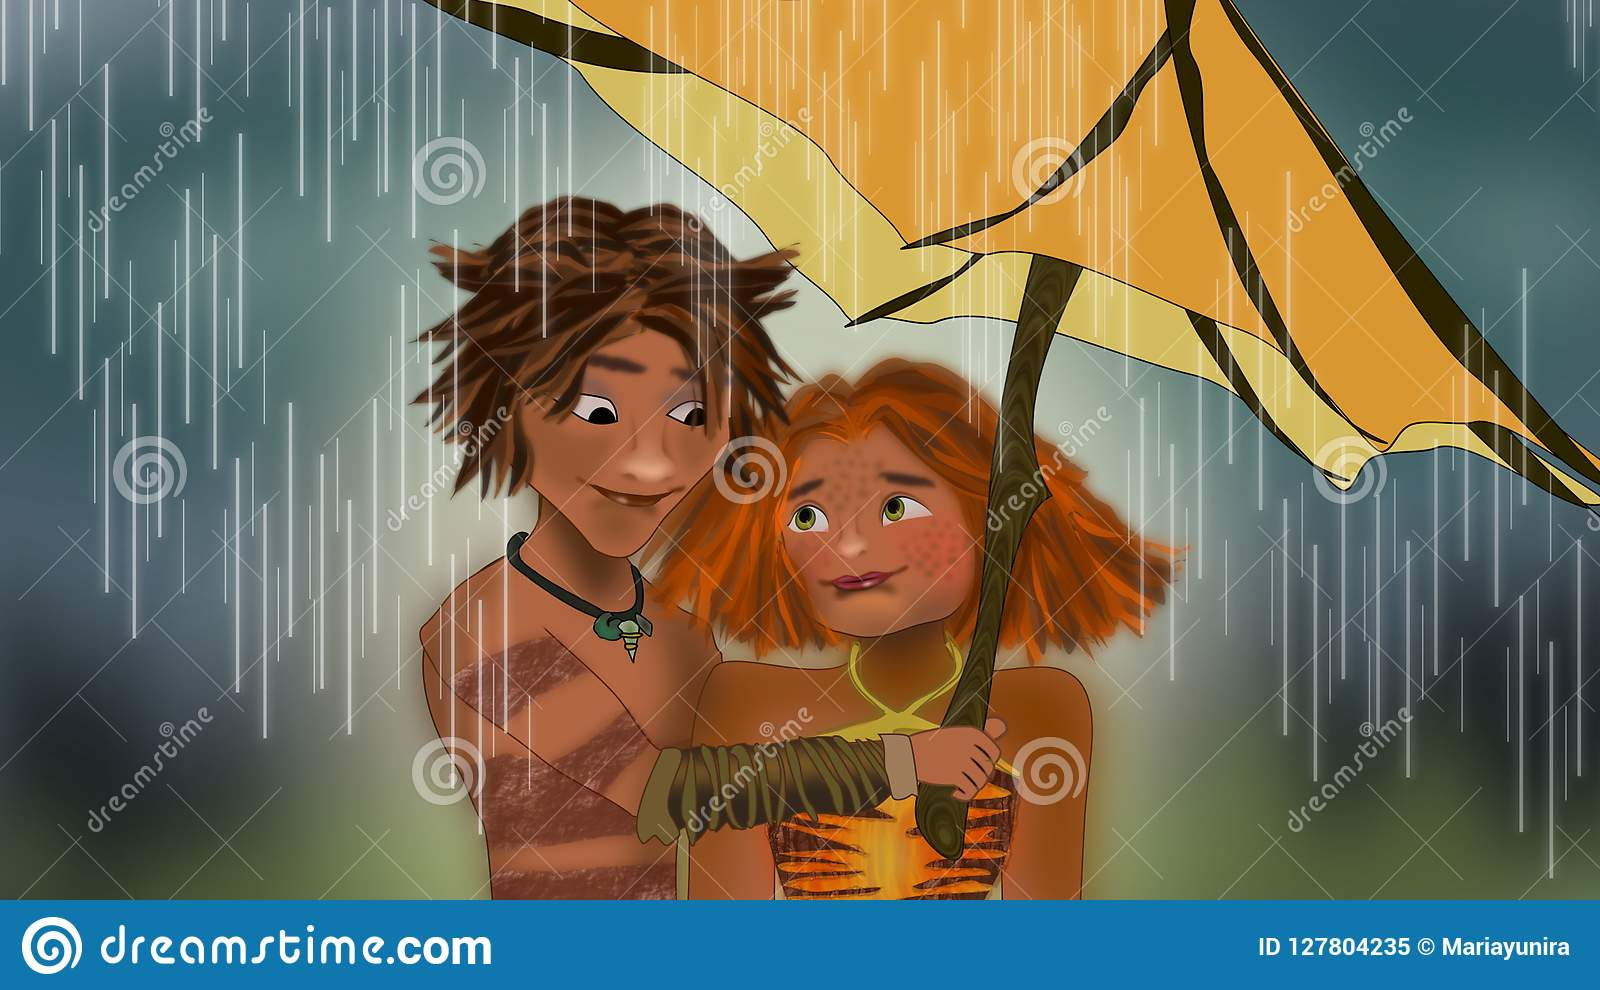 The croods under the rain scene